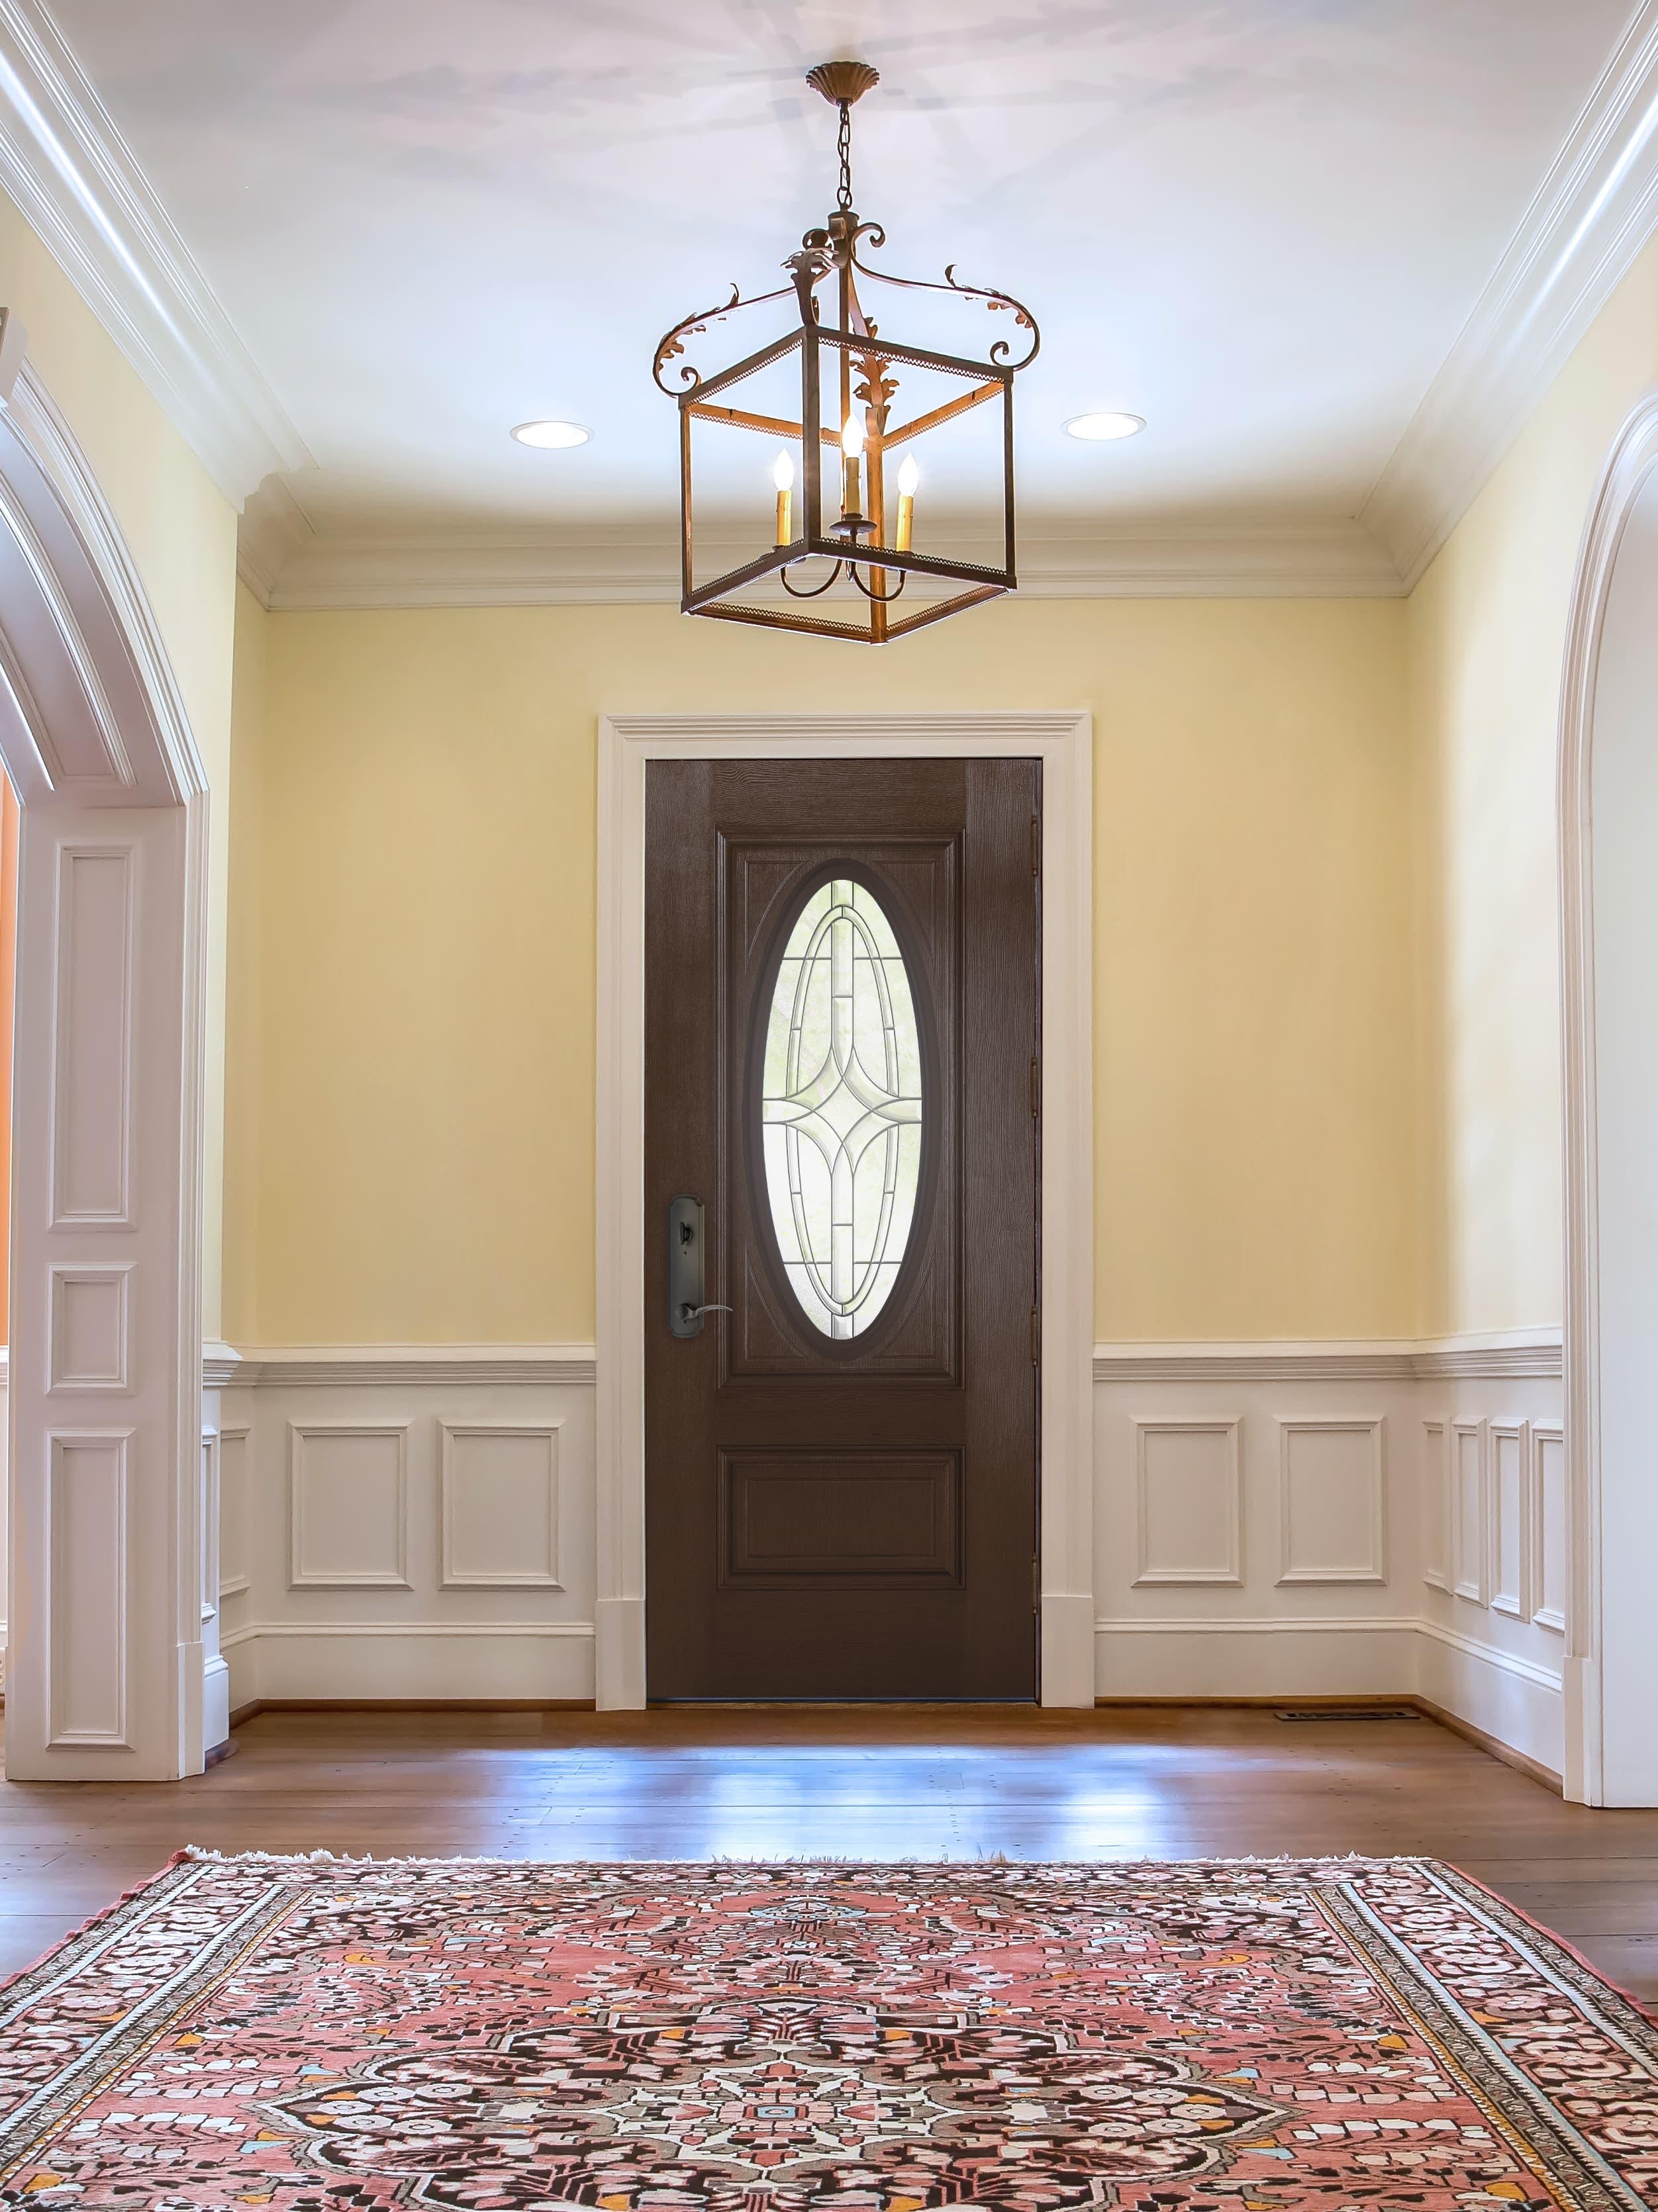 Brown front door with ornate glass in elegant entryway